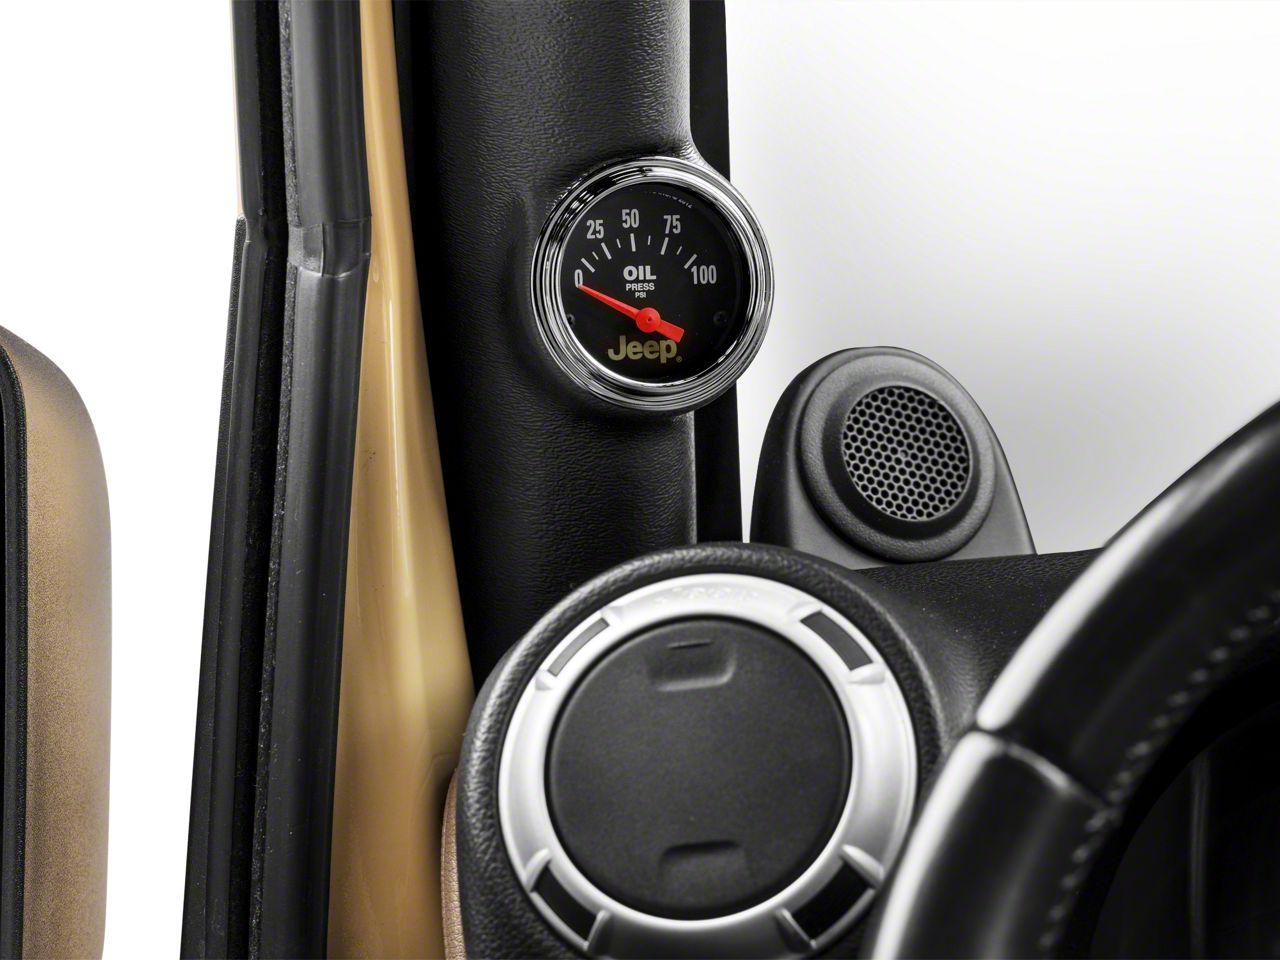 Auto Meter Oil Pressure Gauge - Electrical - Jeep Logo (87-18 Jeep Wrangler YJ, TJ, JK & JL)